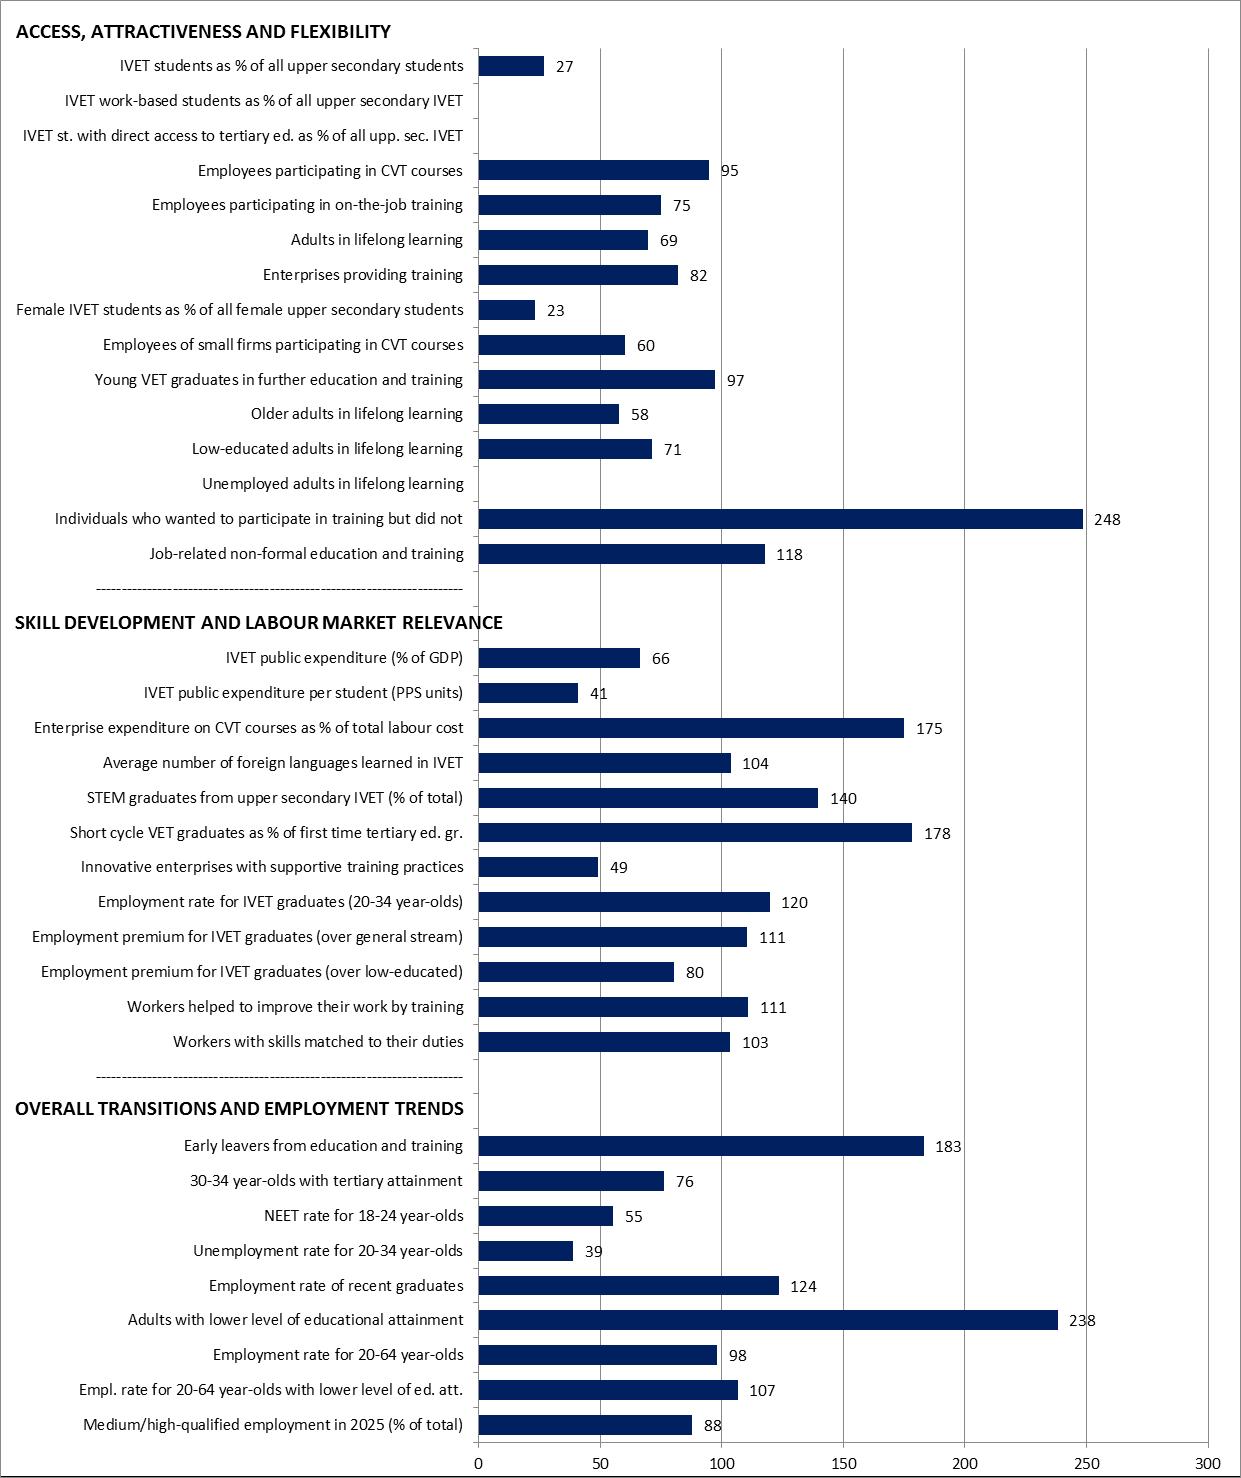 Malta Graph Statistical overviews on VET 2017